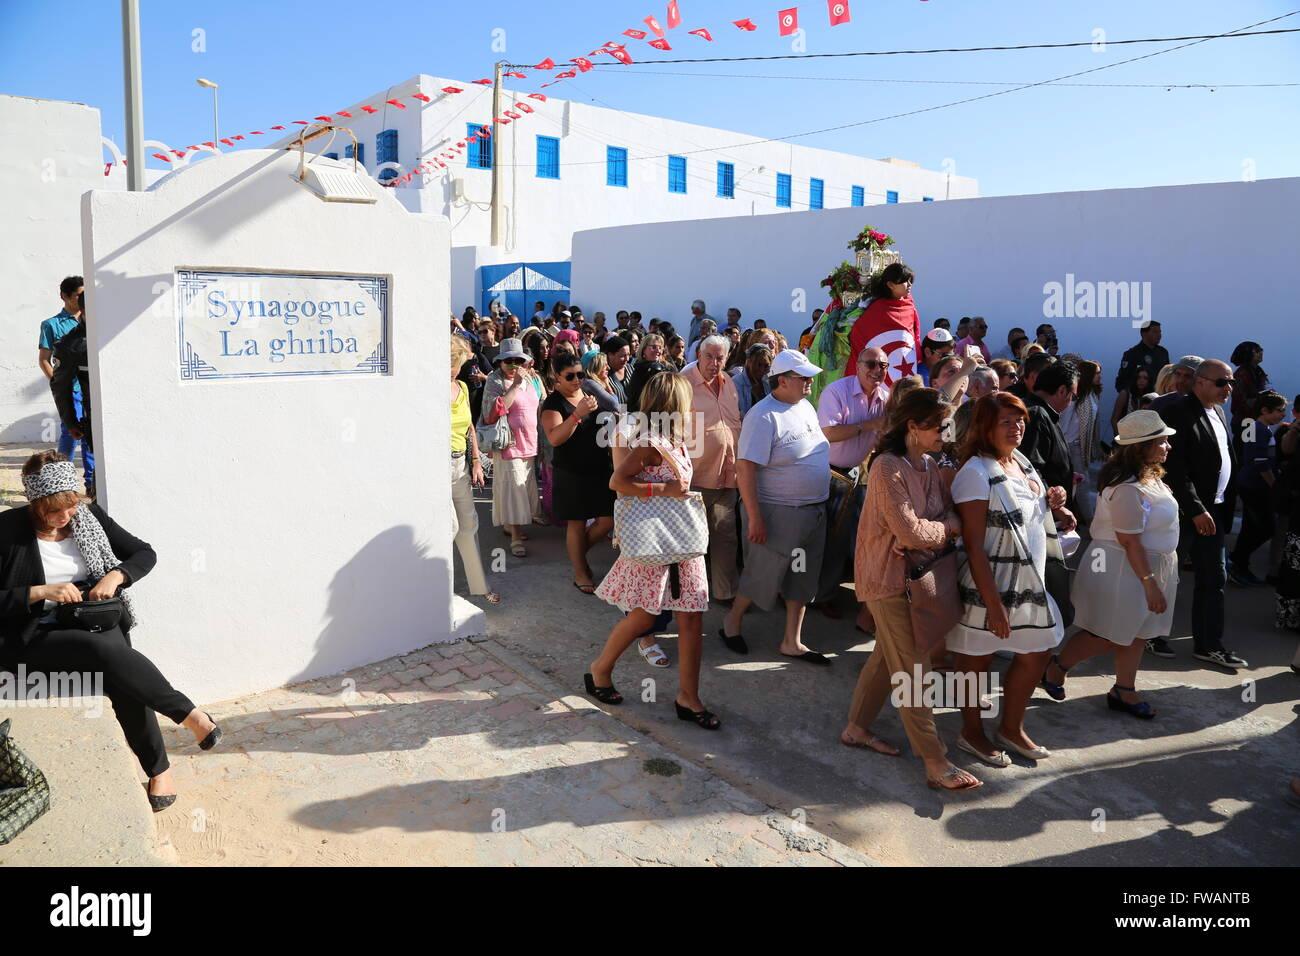 Tunisia : Pilgrimage to the Ghriba Synagogue -  16/05/2014  -  Tunisia / Djerba / Djerba  -  Procession of the Menorah - Stock Image